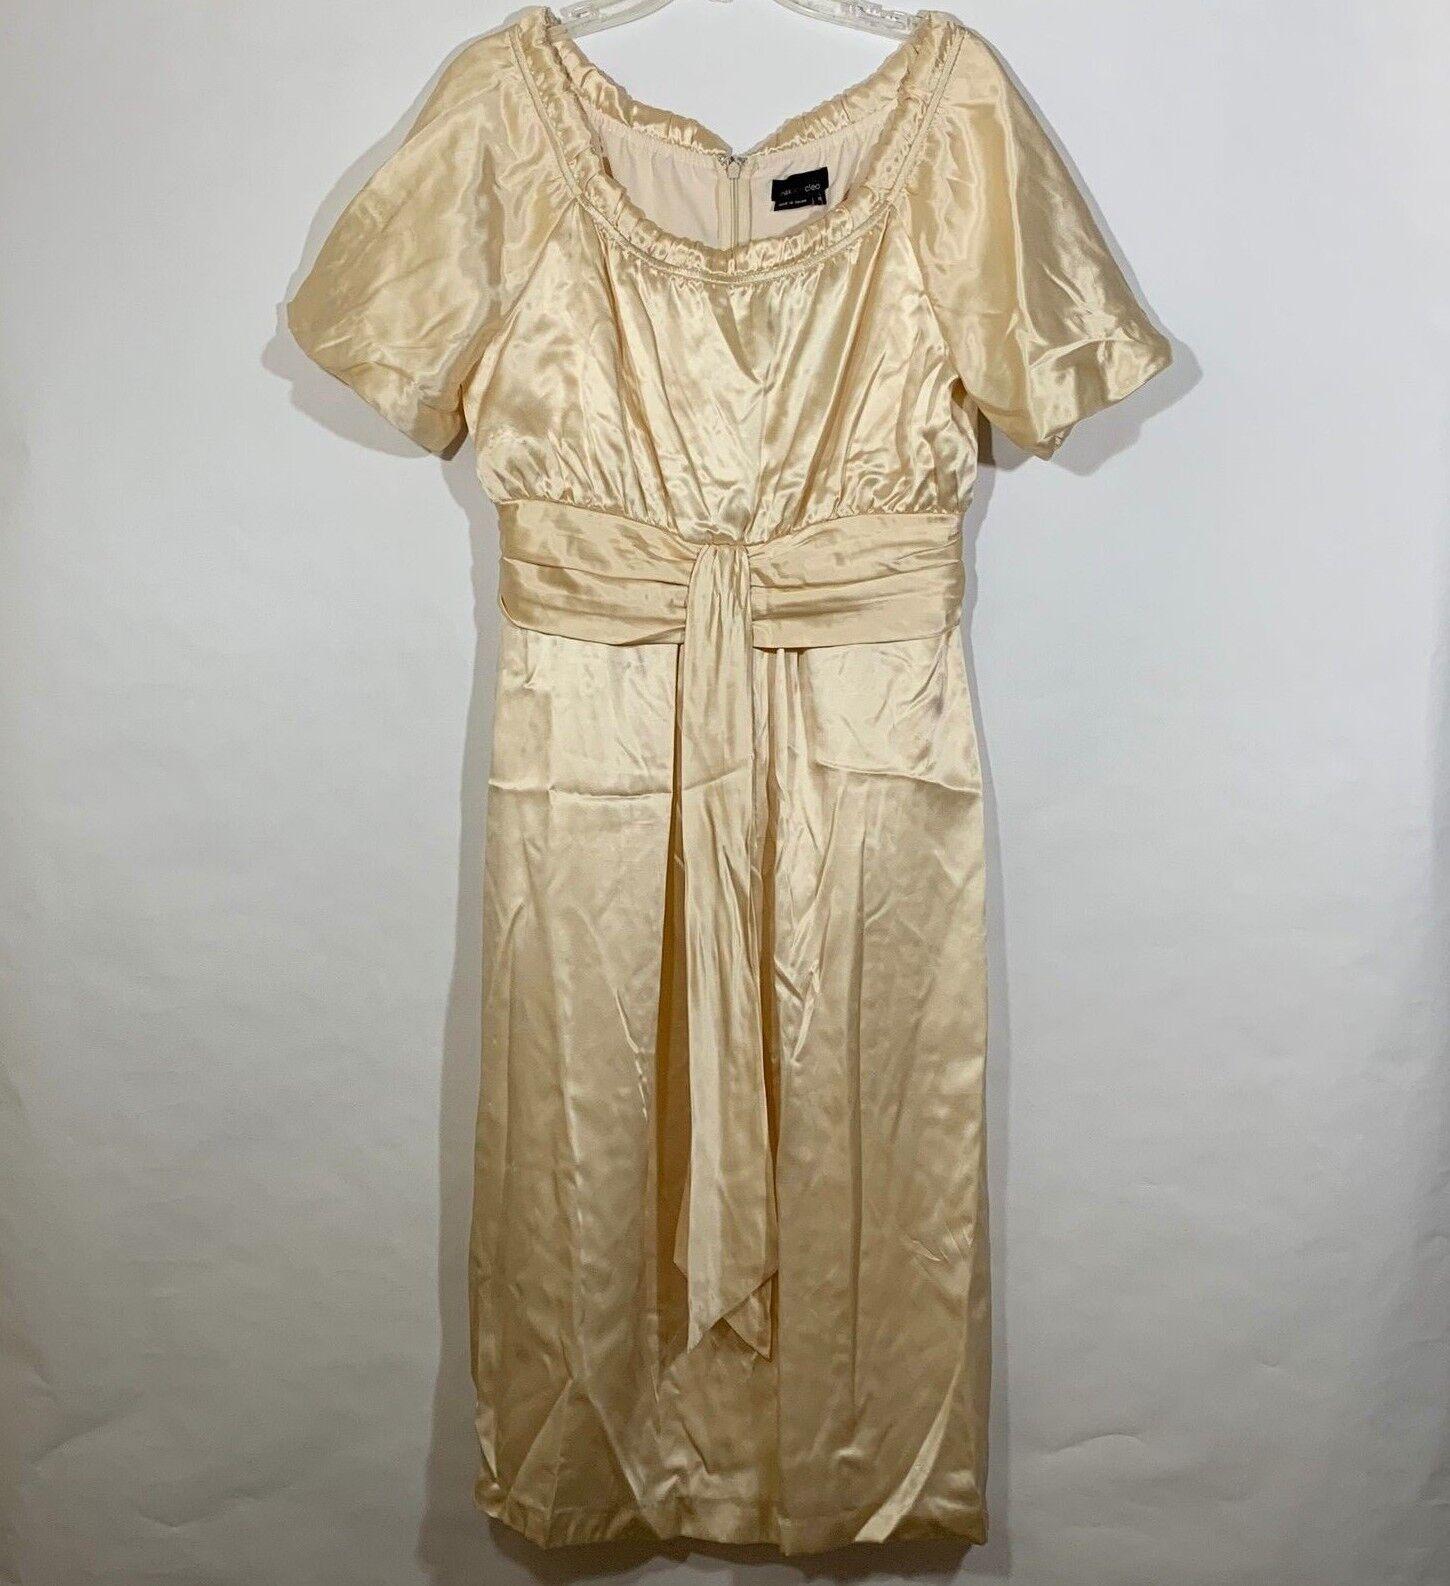 NEW Max Cleo Empire Waist SILK Formal Formal Formal Modest Dress  188 Bubble Sleeve Midi Sz 12 09d5aa